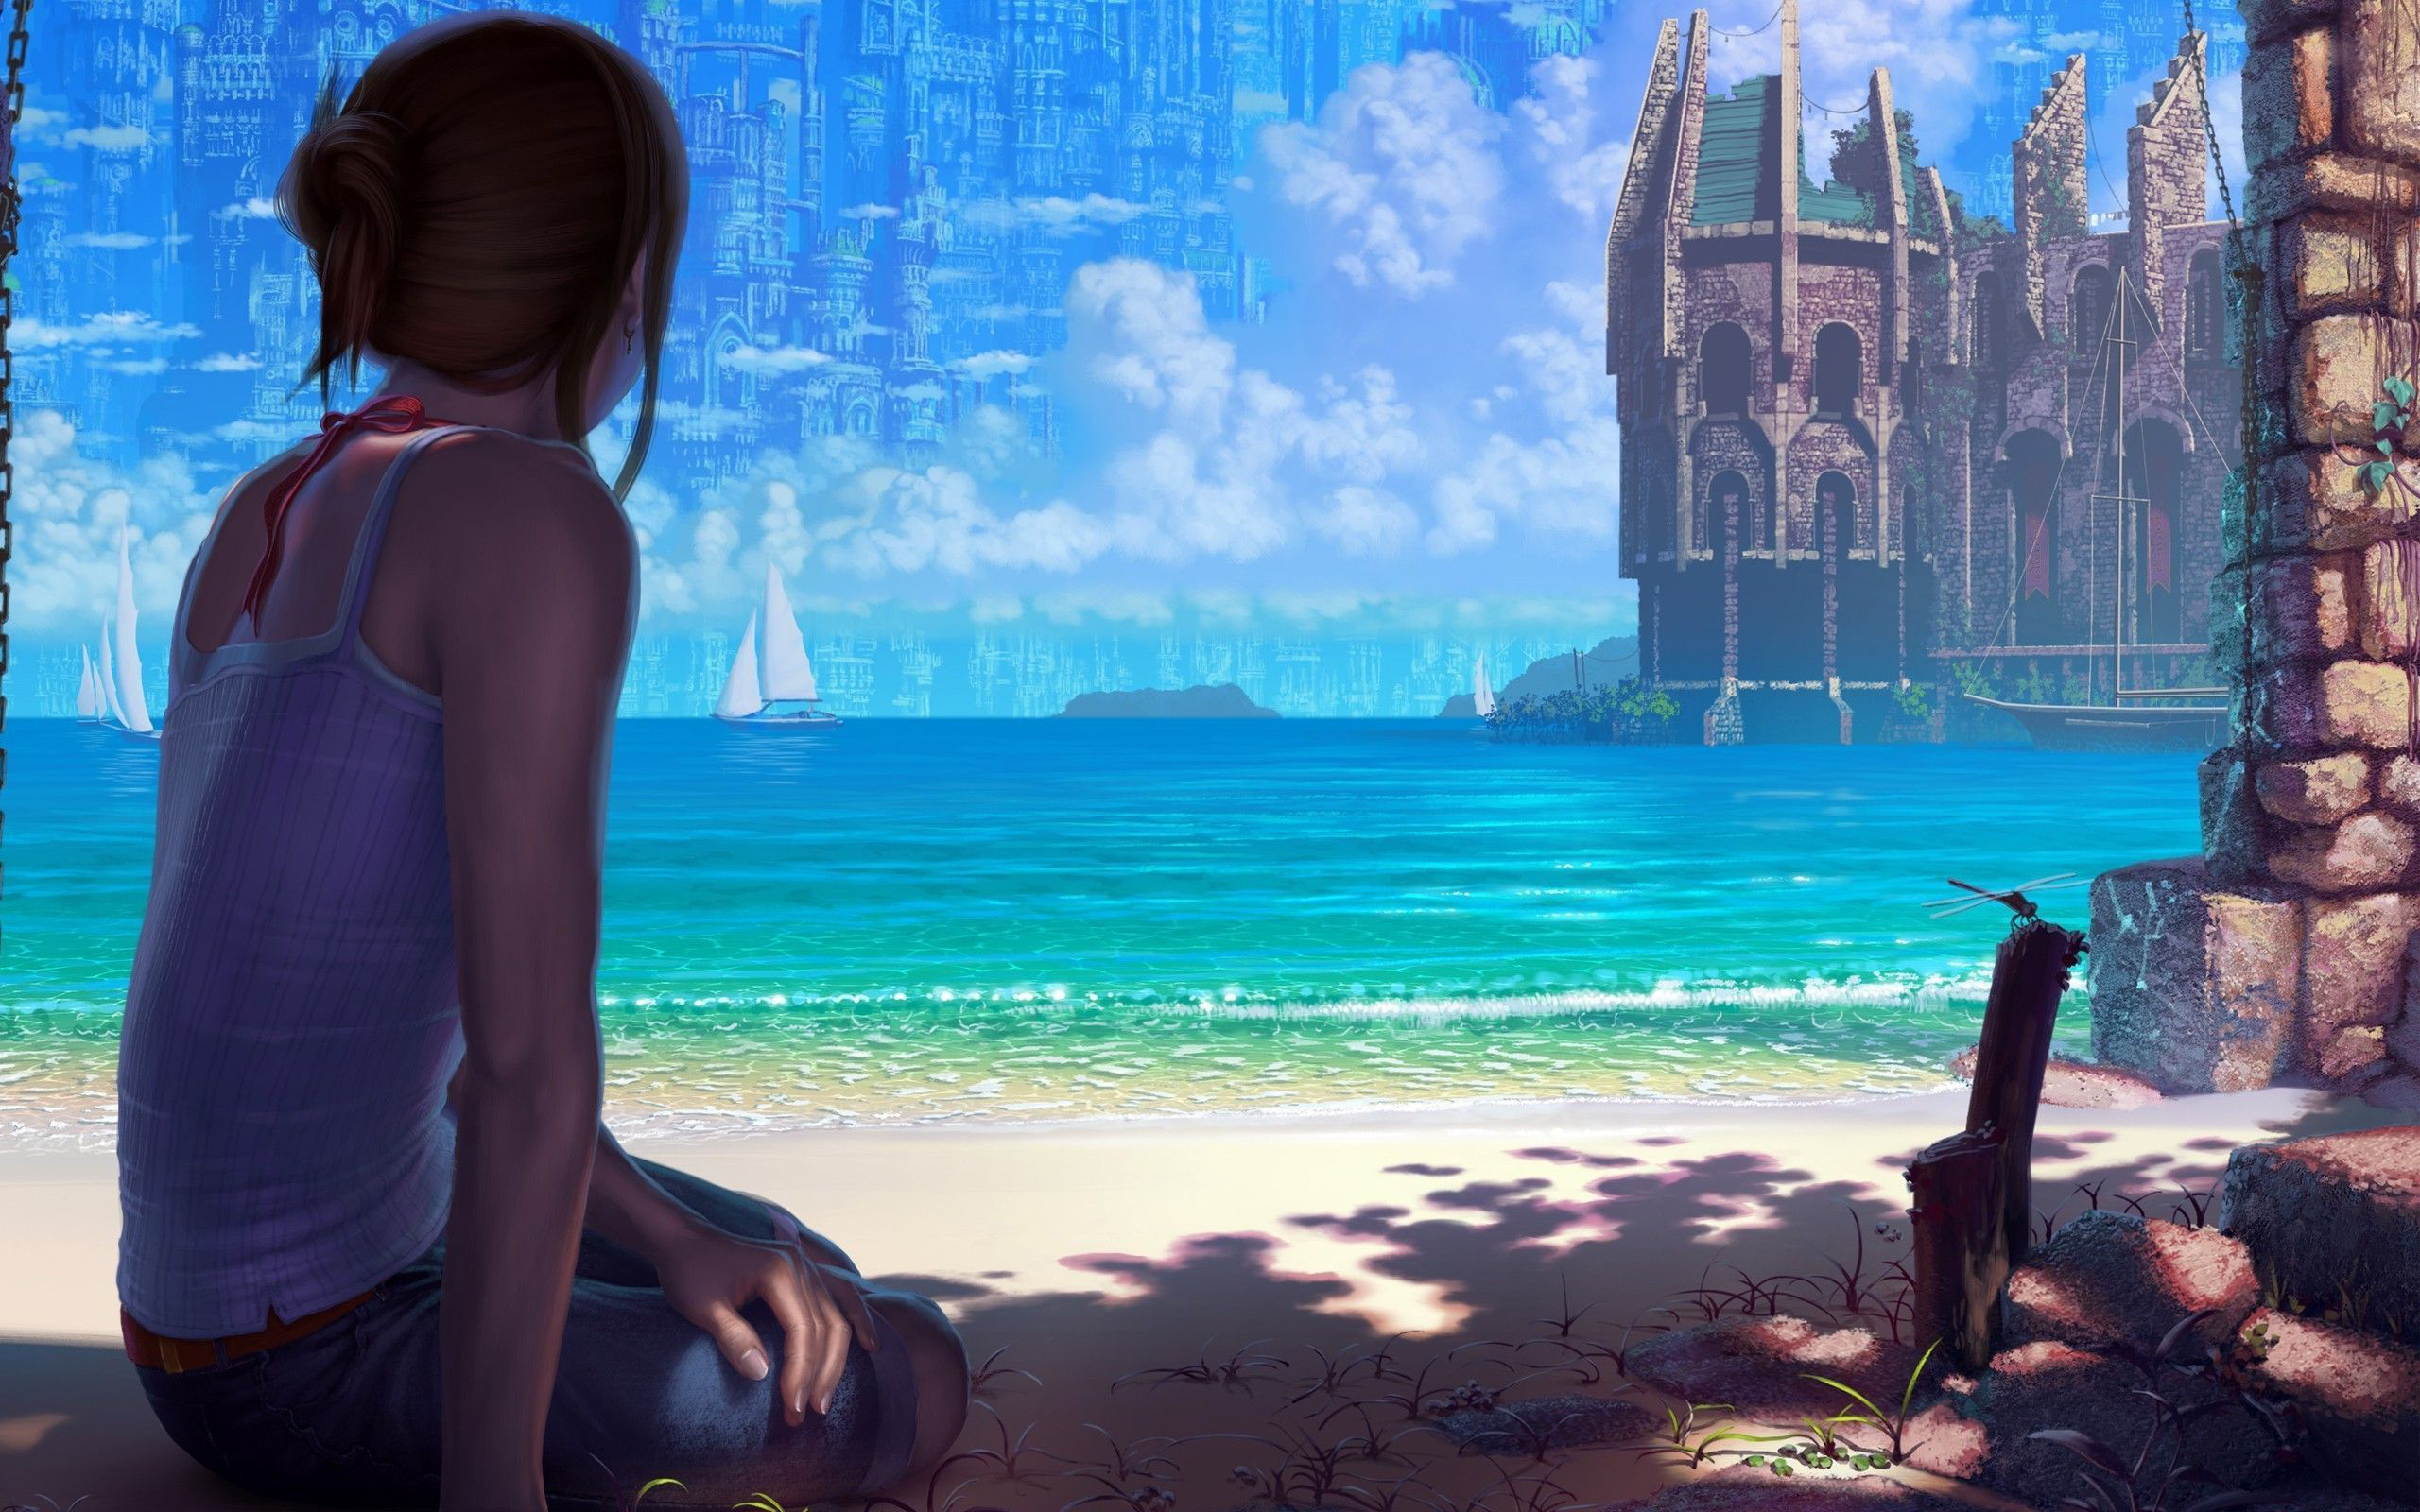 Beach Boat Building Girl 2560x1600